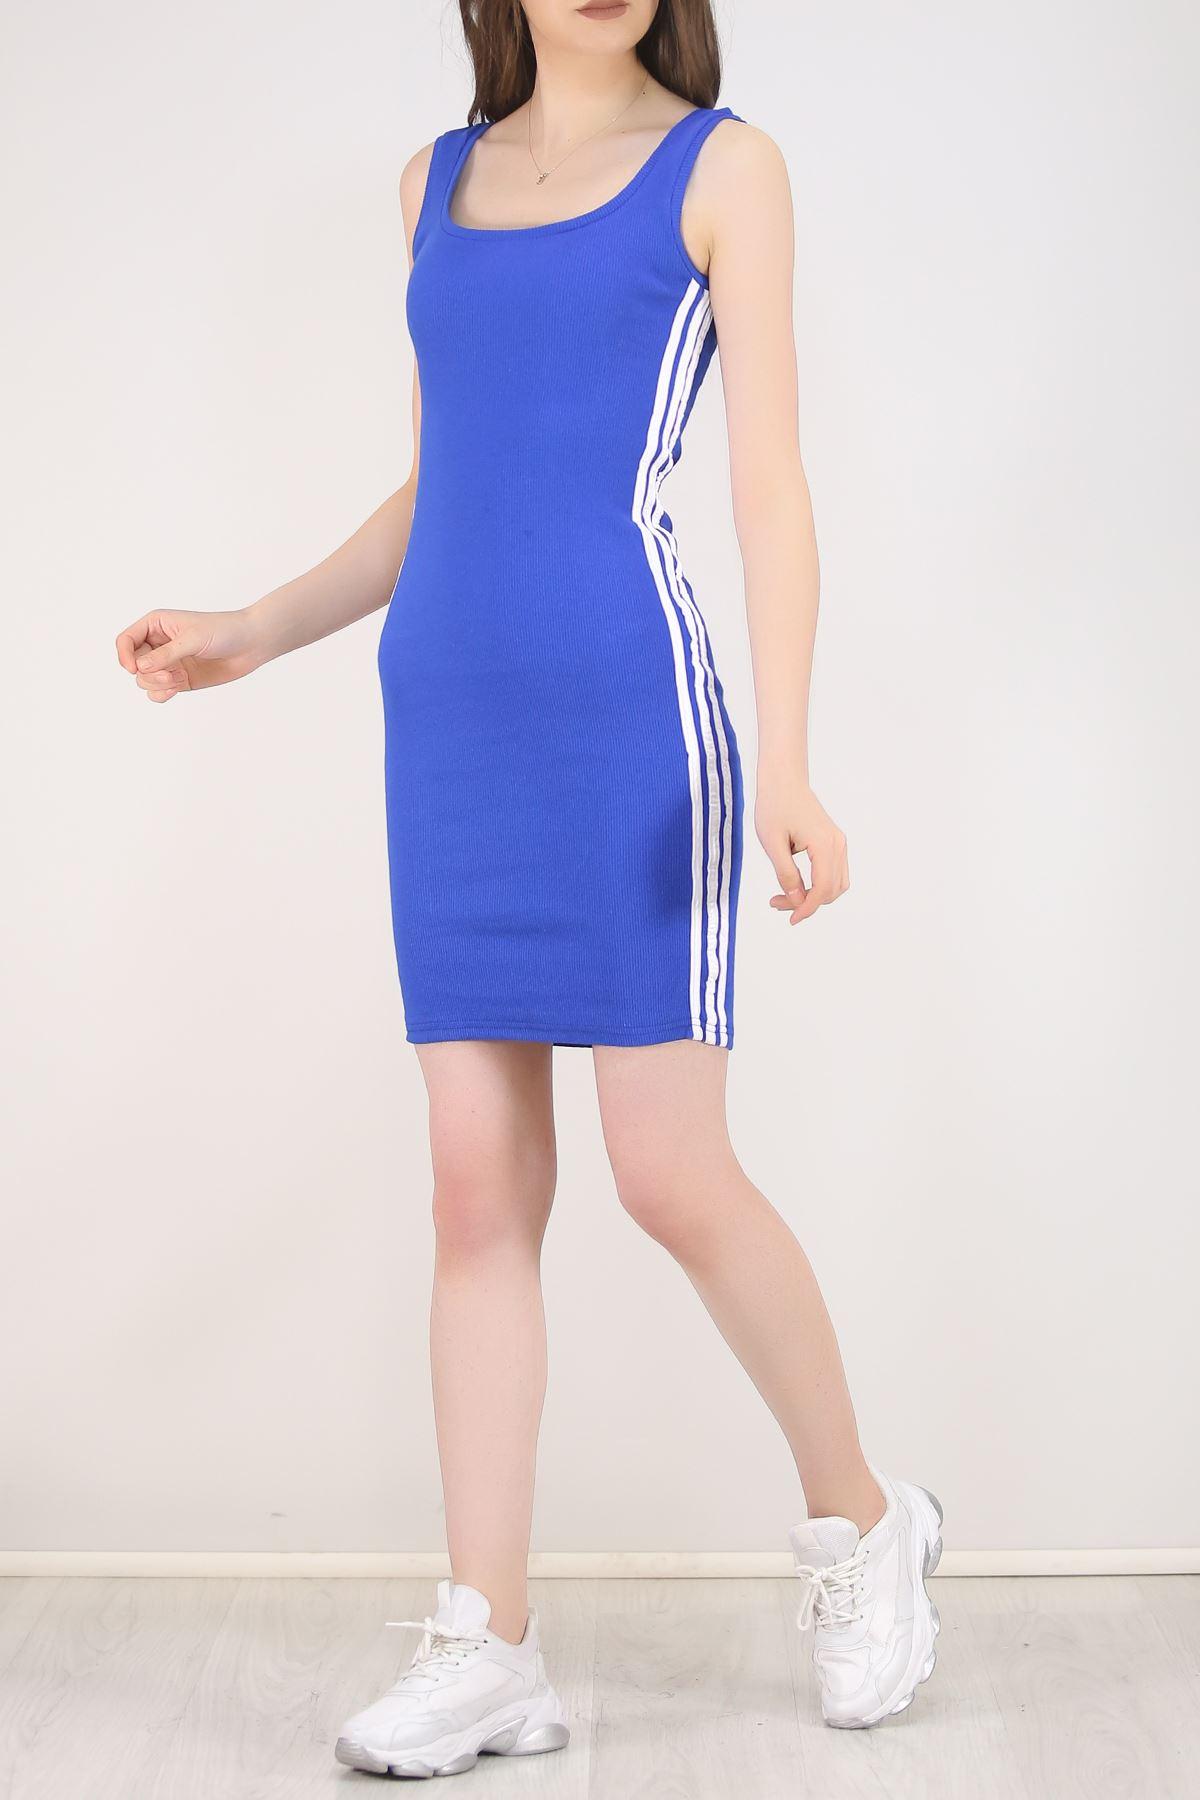 Kaşkorse Şeritli Elbise Saks - 5693.316.